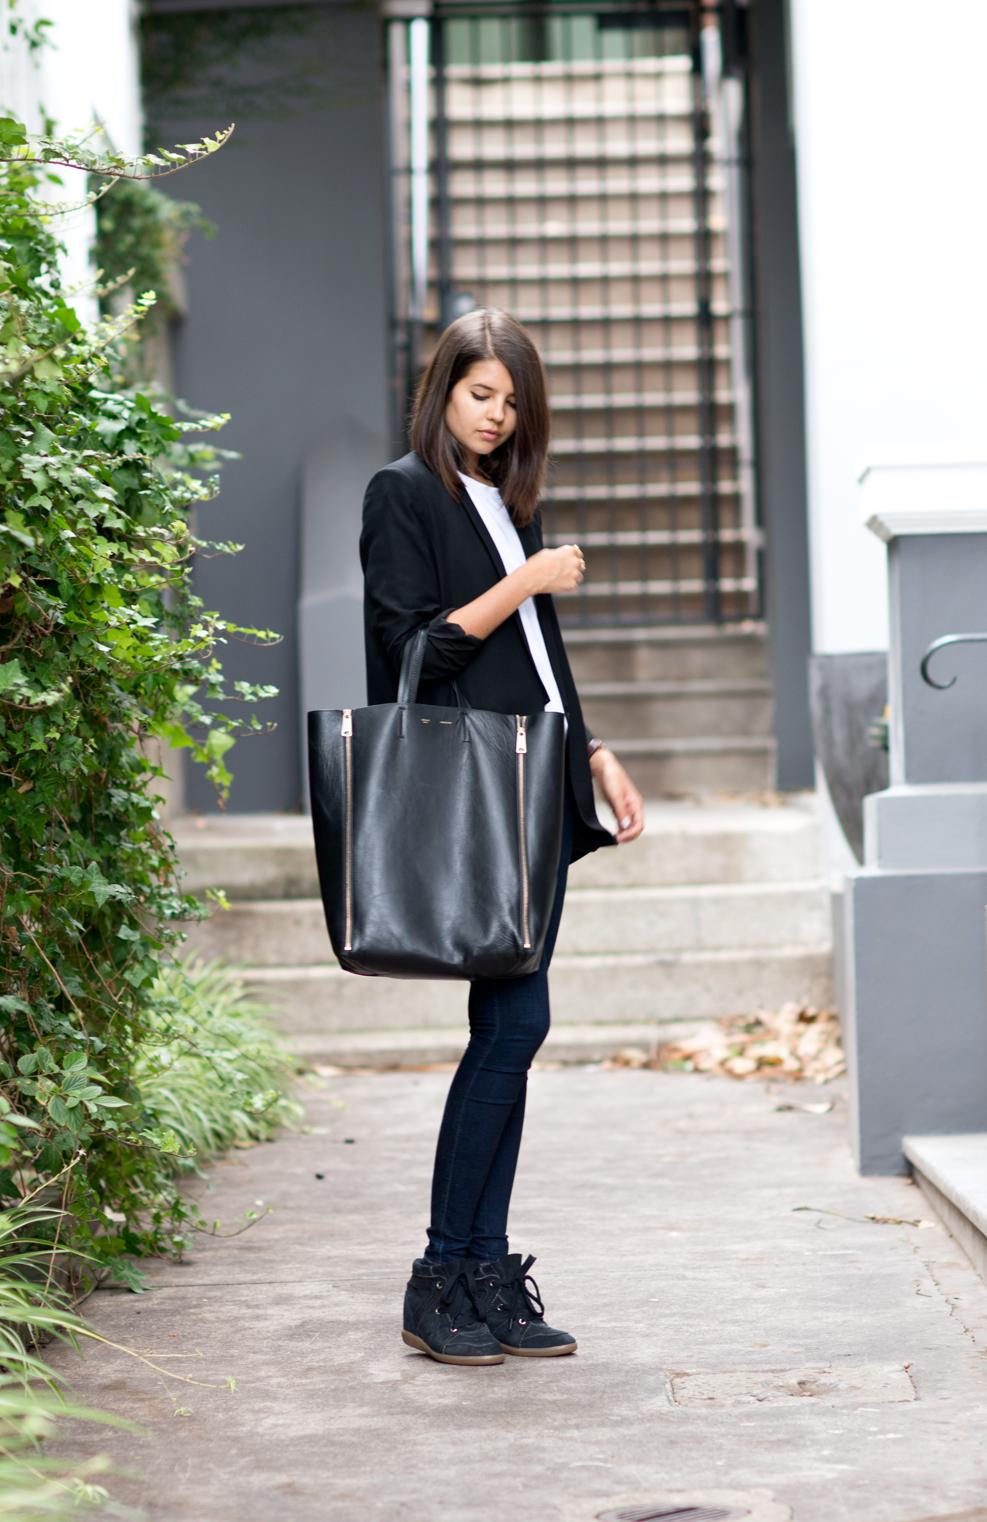 Helmut Lang boyfriend blazer, Alexander Wang T-shirt, Nobody Denim jeans, Isabel Marant Bobby sneakers, Celine Cabas bag.